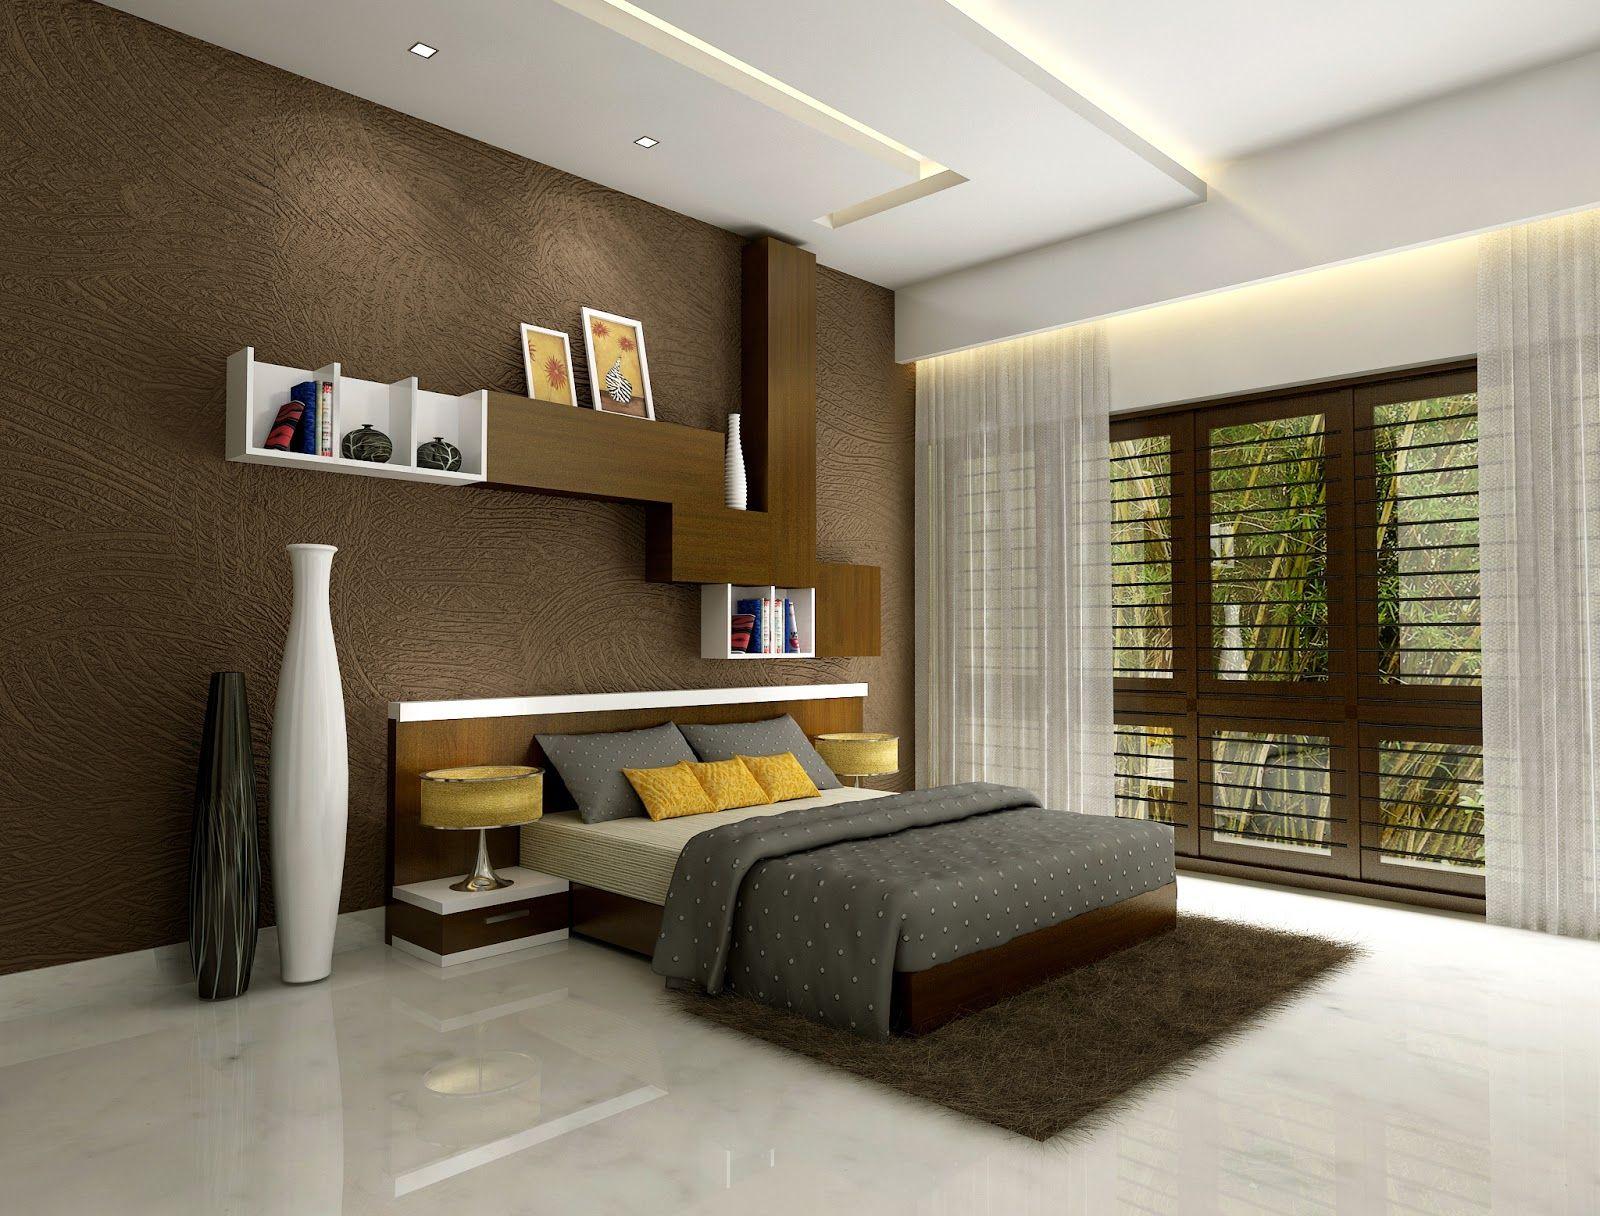 Modern-Bedroom-Design-Ideas-2014-Of-Modern-Bedroom-Ceiling ...